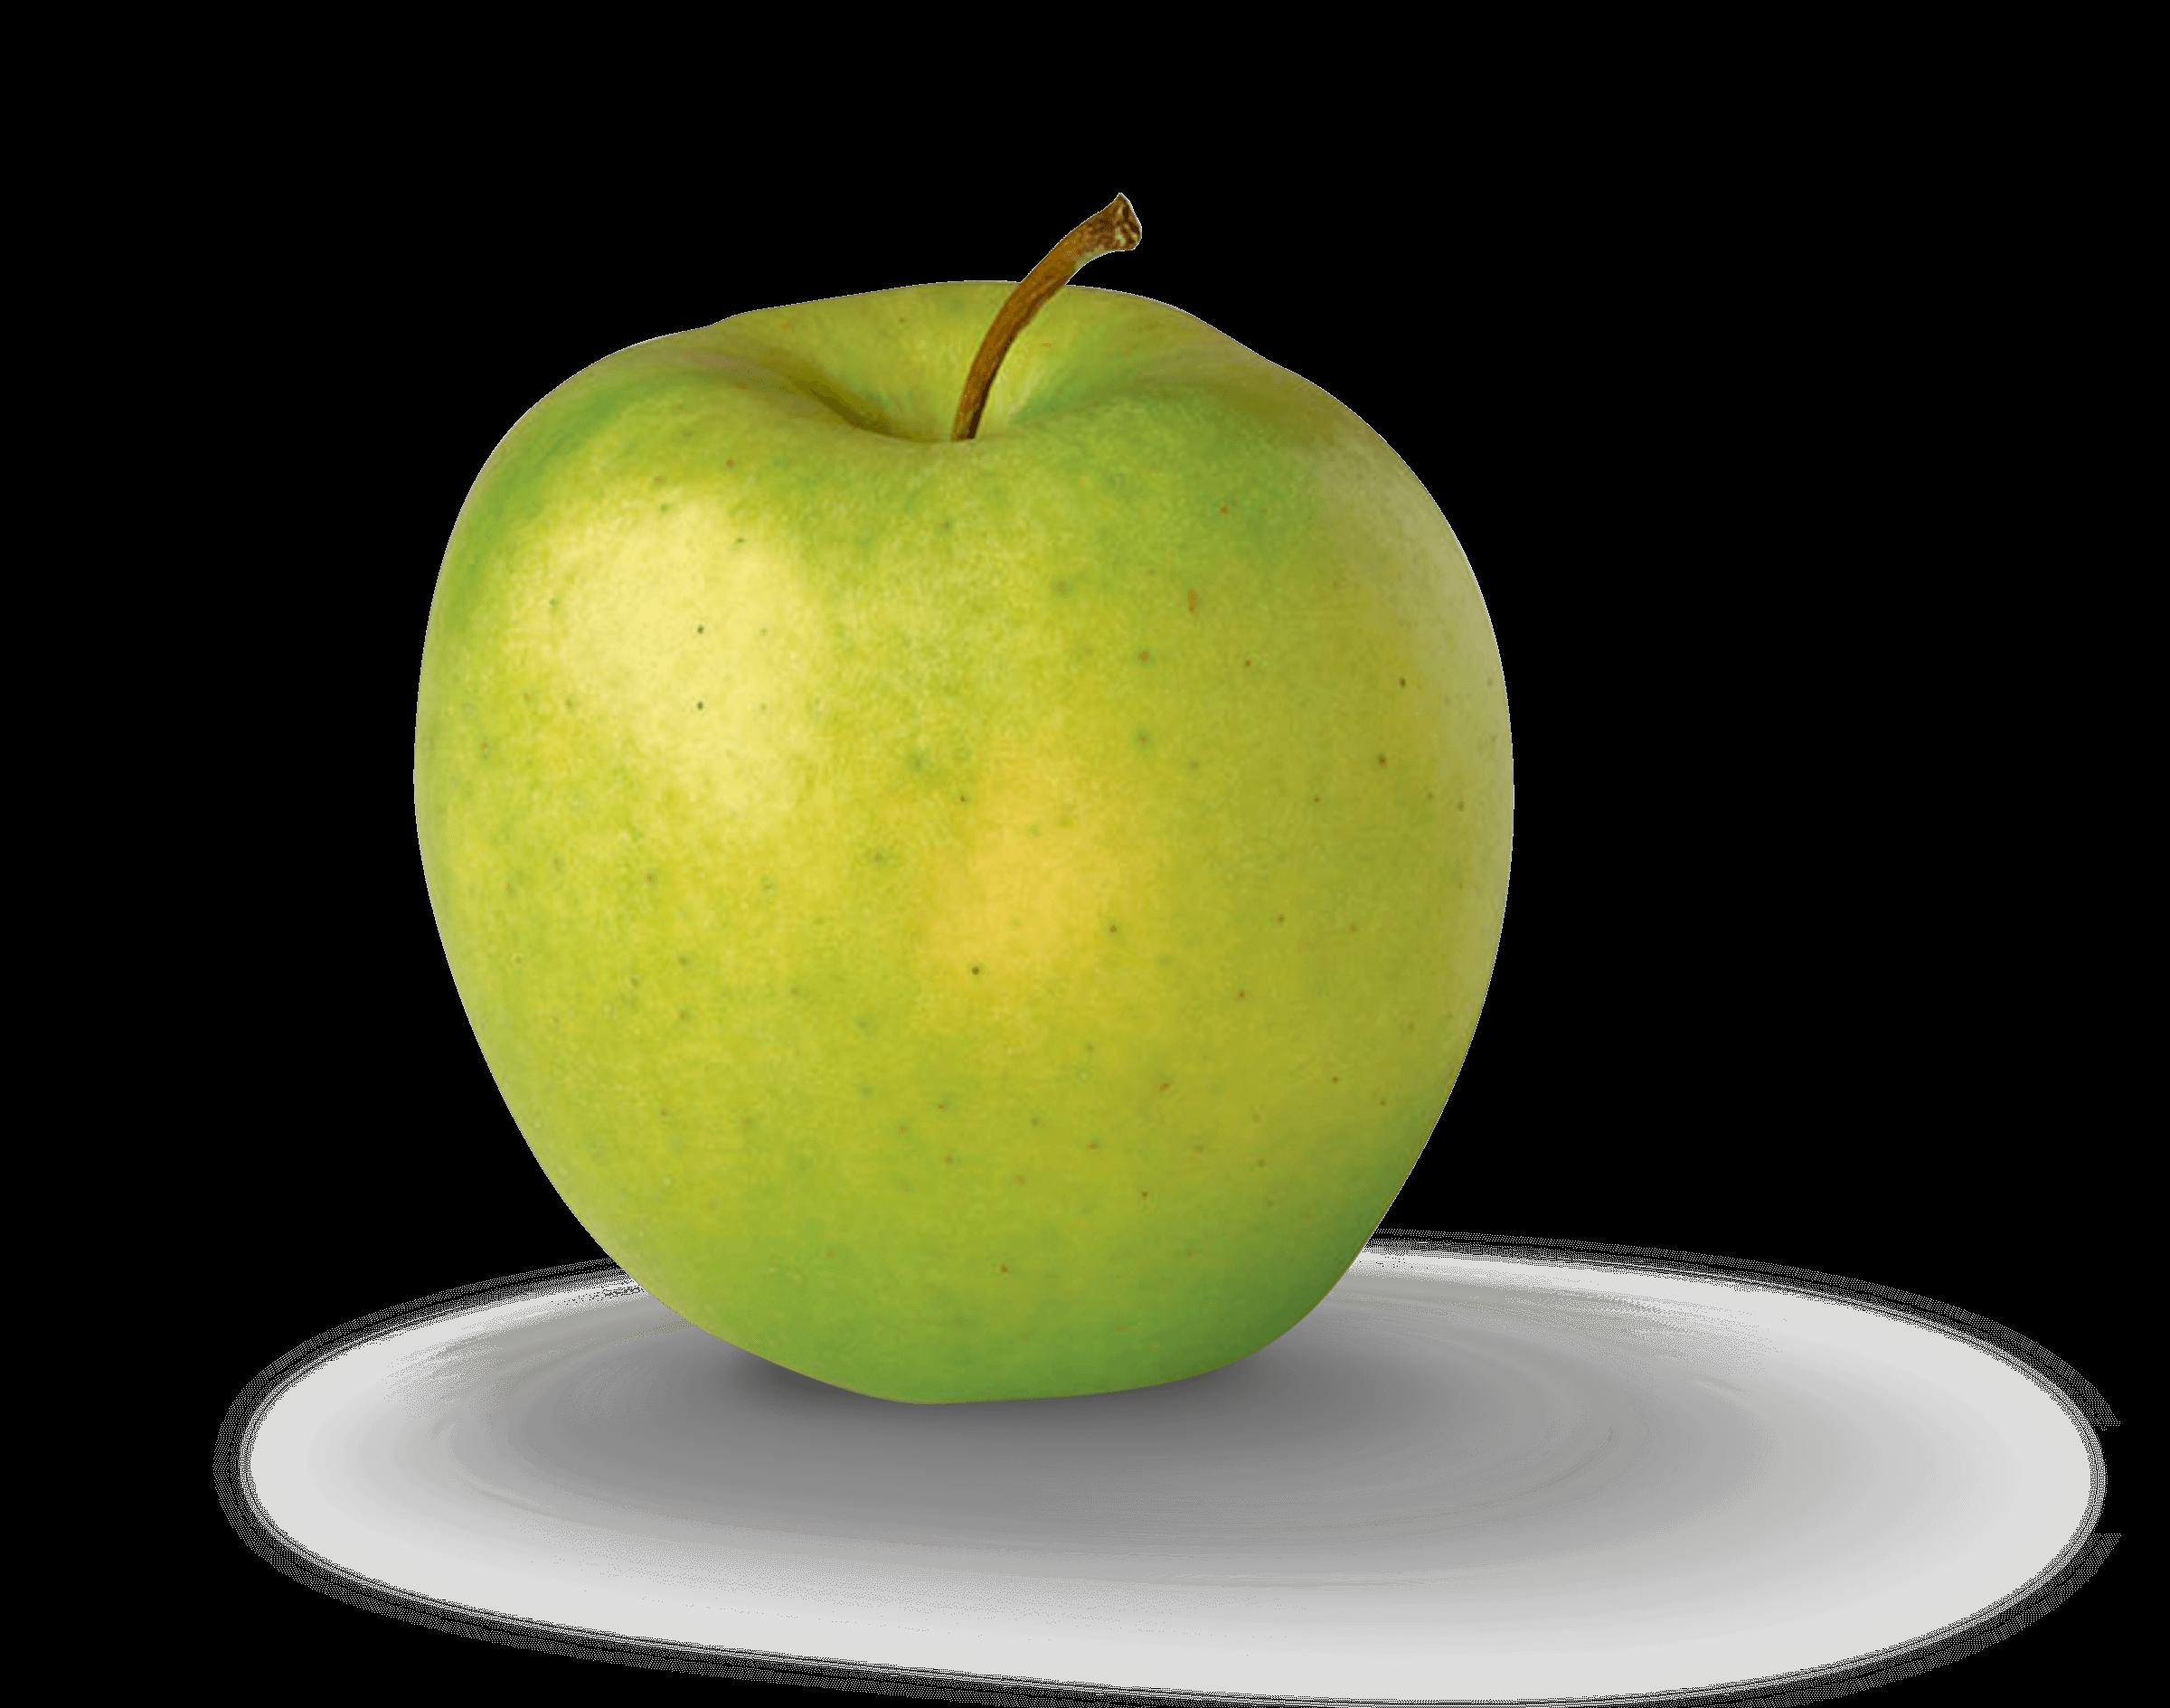 Apple Photo - Crispin